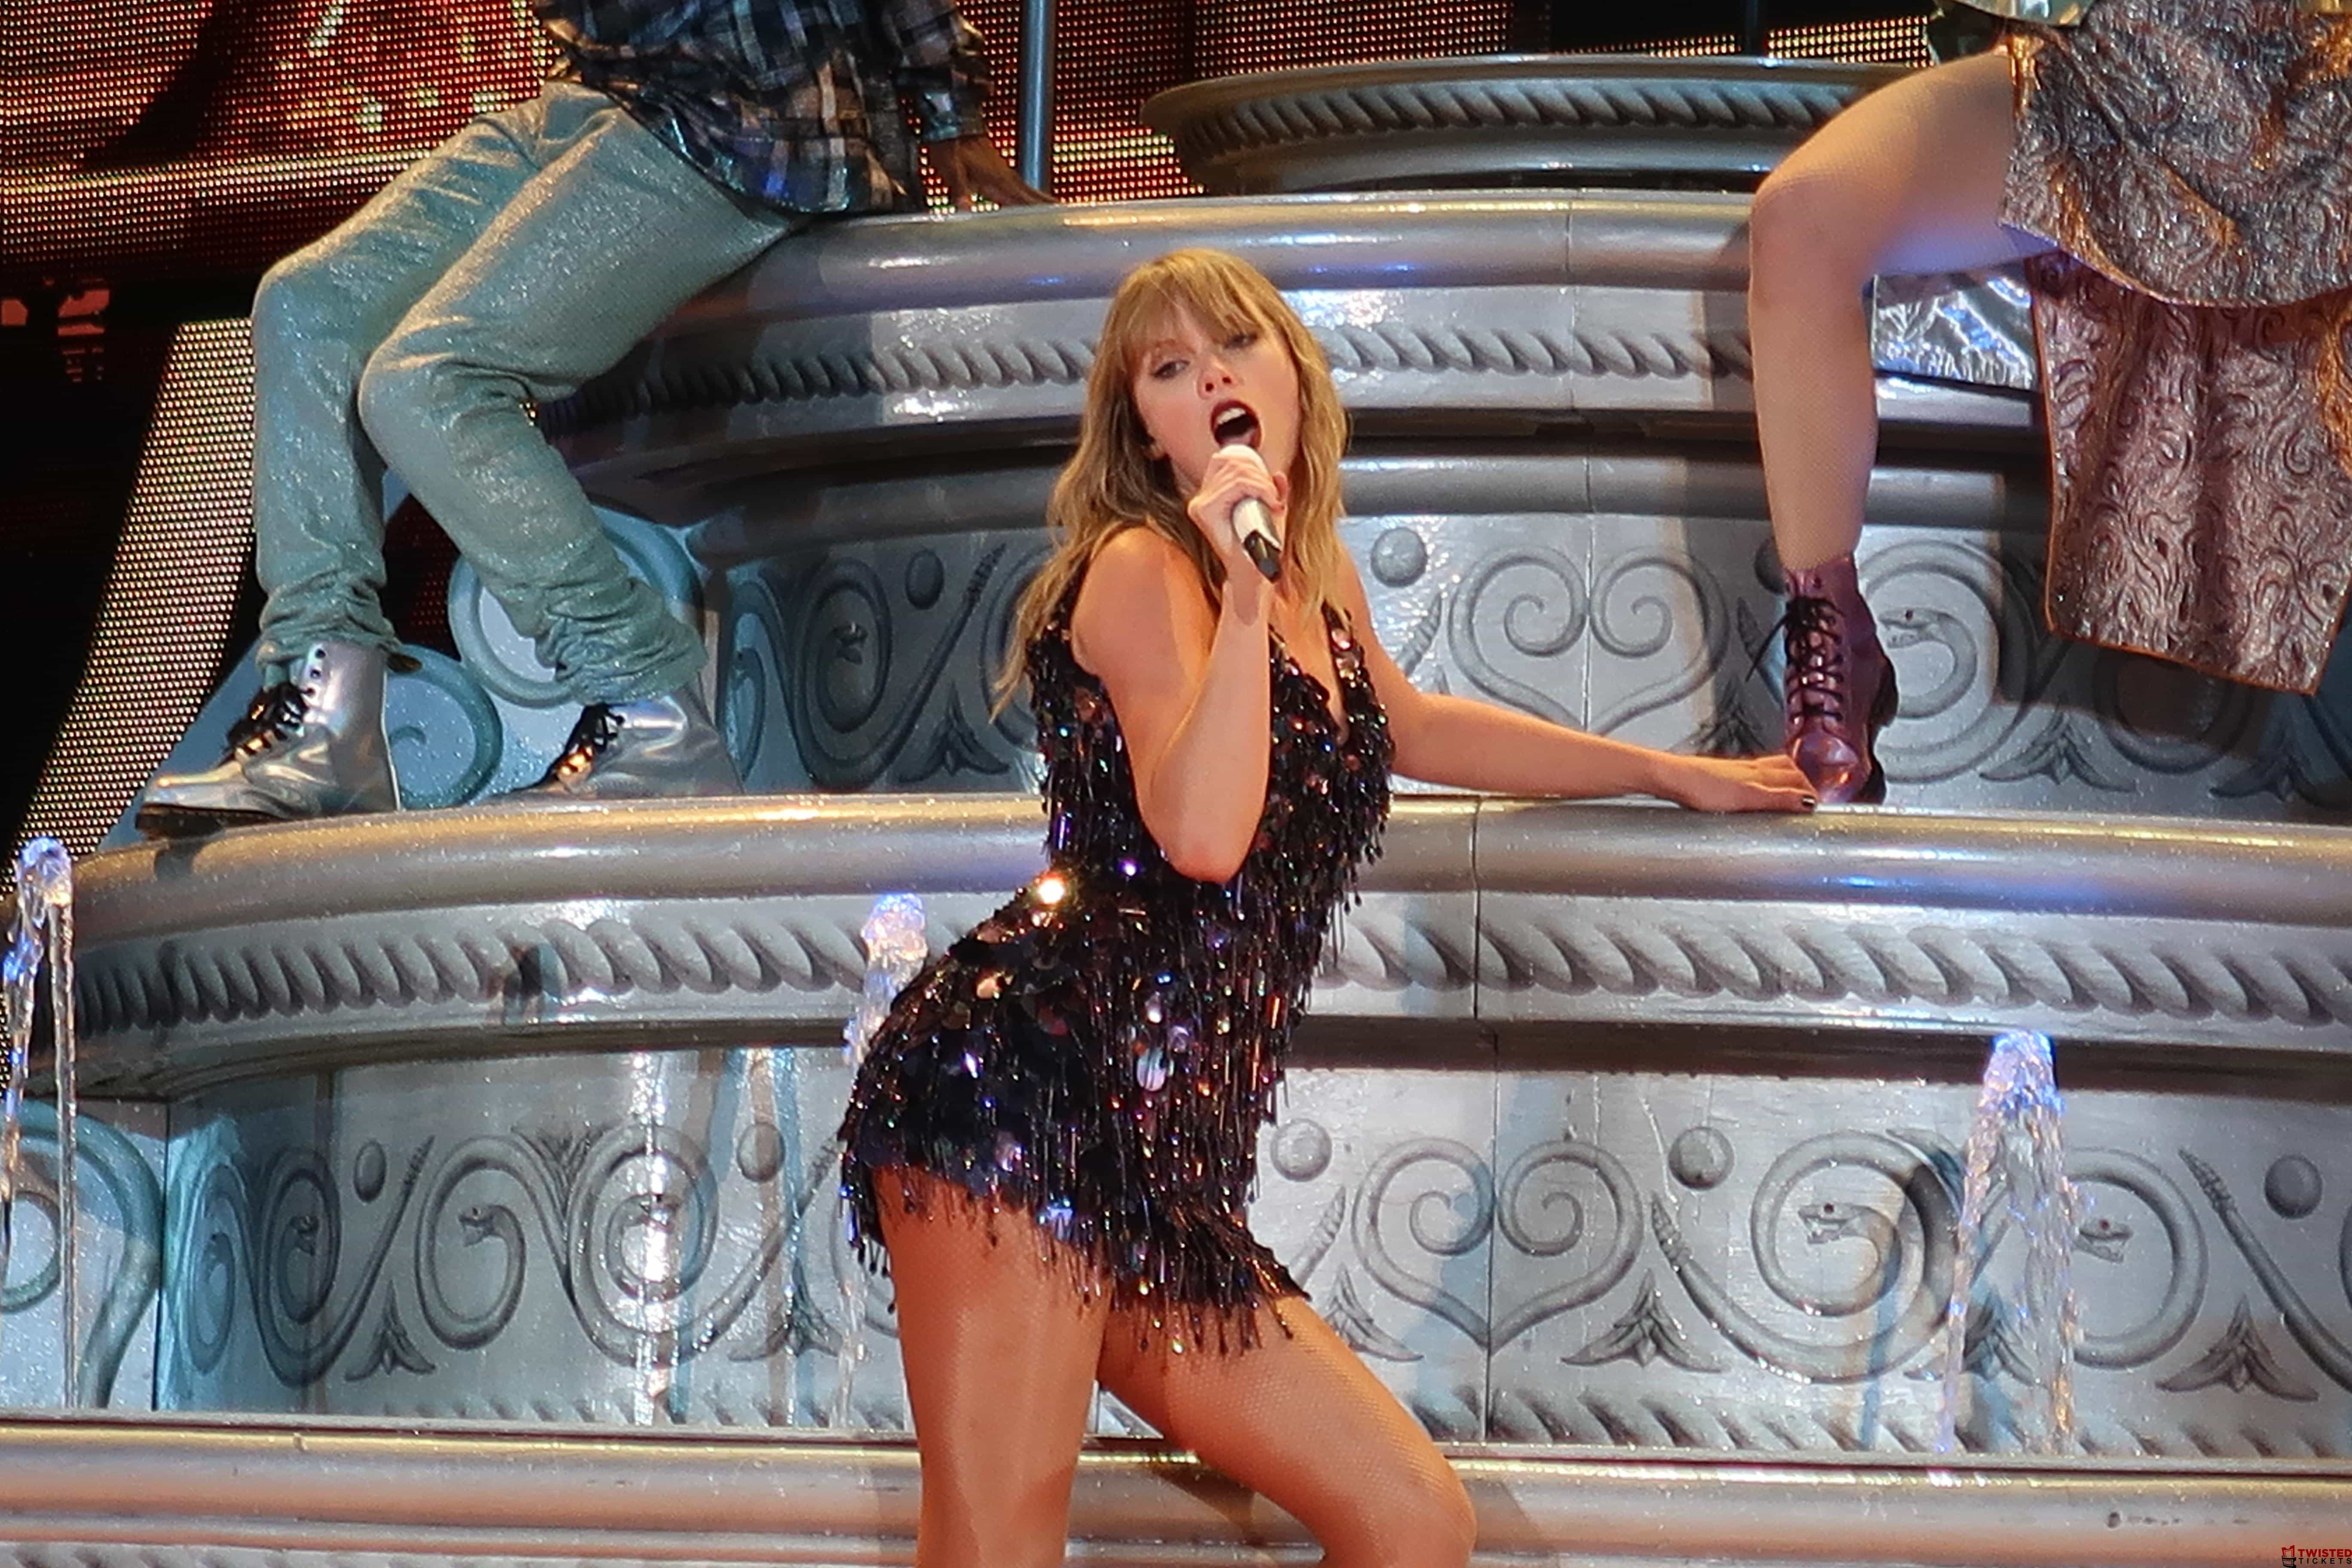 Taylor Swift Concert photo